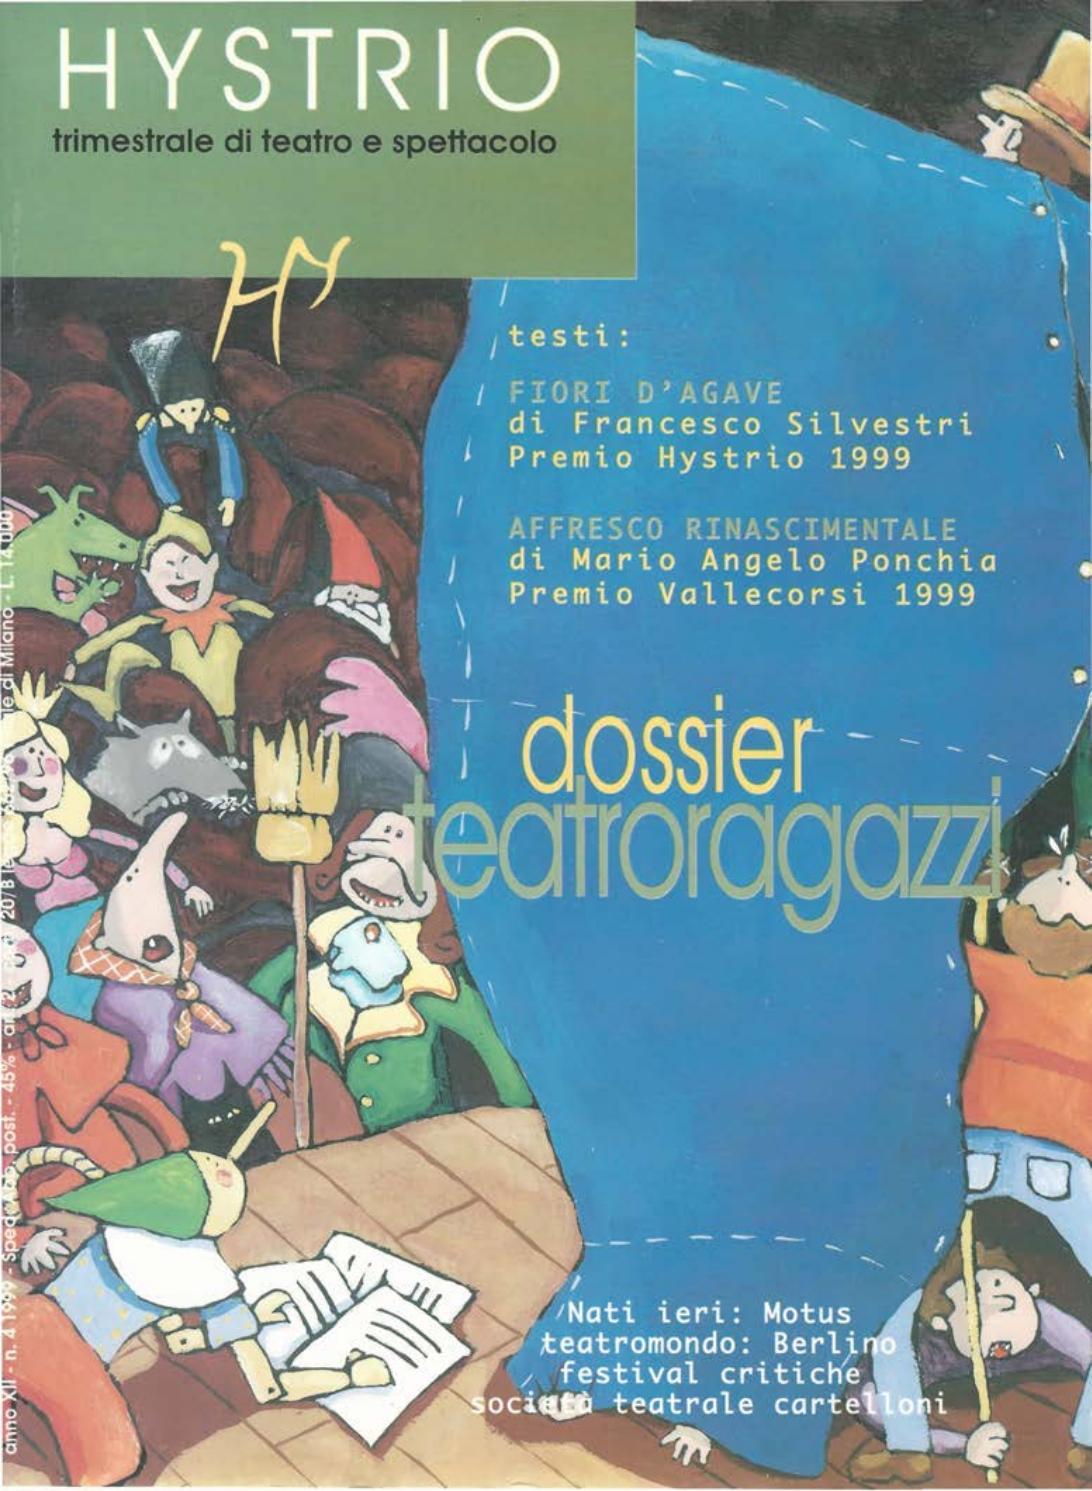 Hystrio 1999 4 ottobre-dicembre by Hystrio - issuu f9872b40fdb